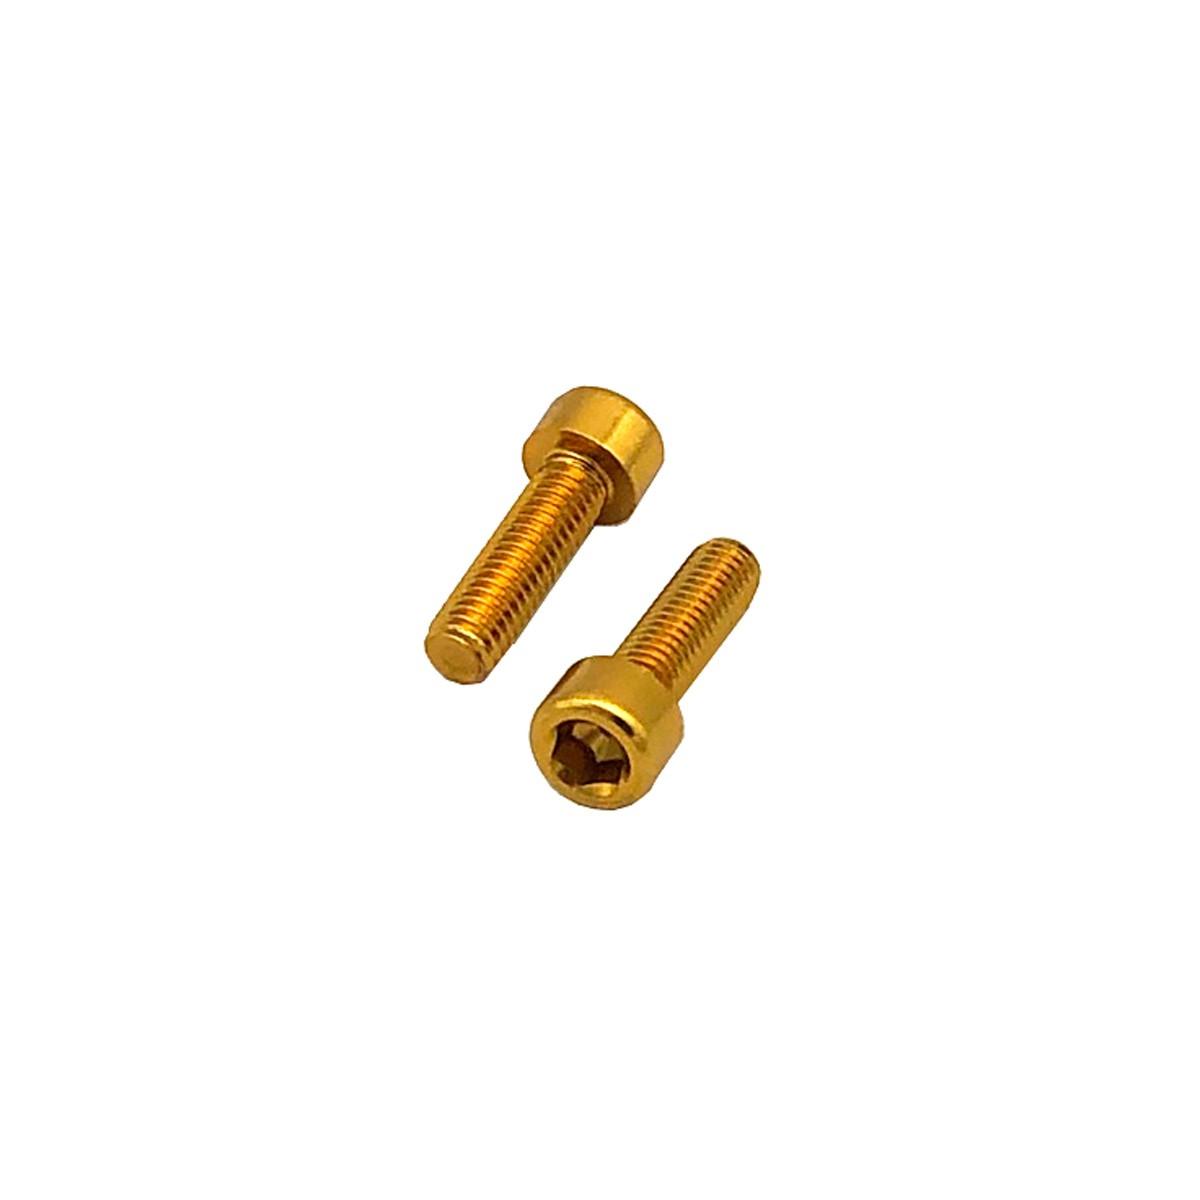 Parafuso Allen de Aluminio Socket Cap M6 x 16mm Dourado